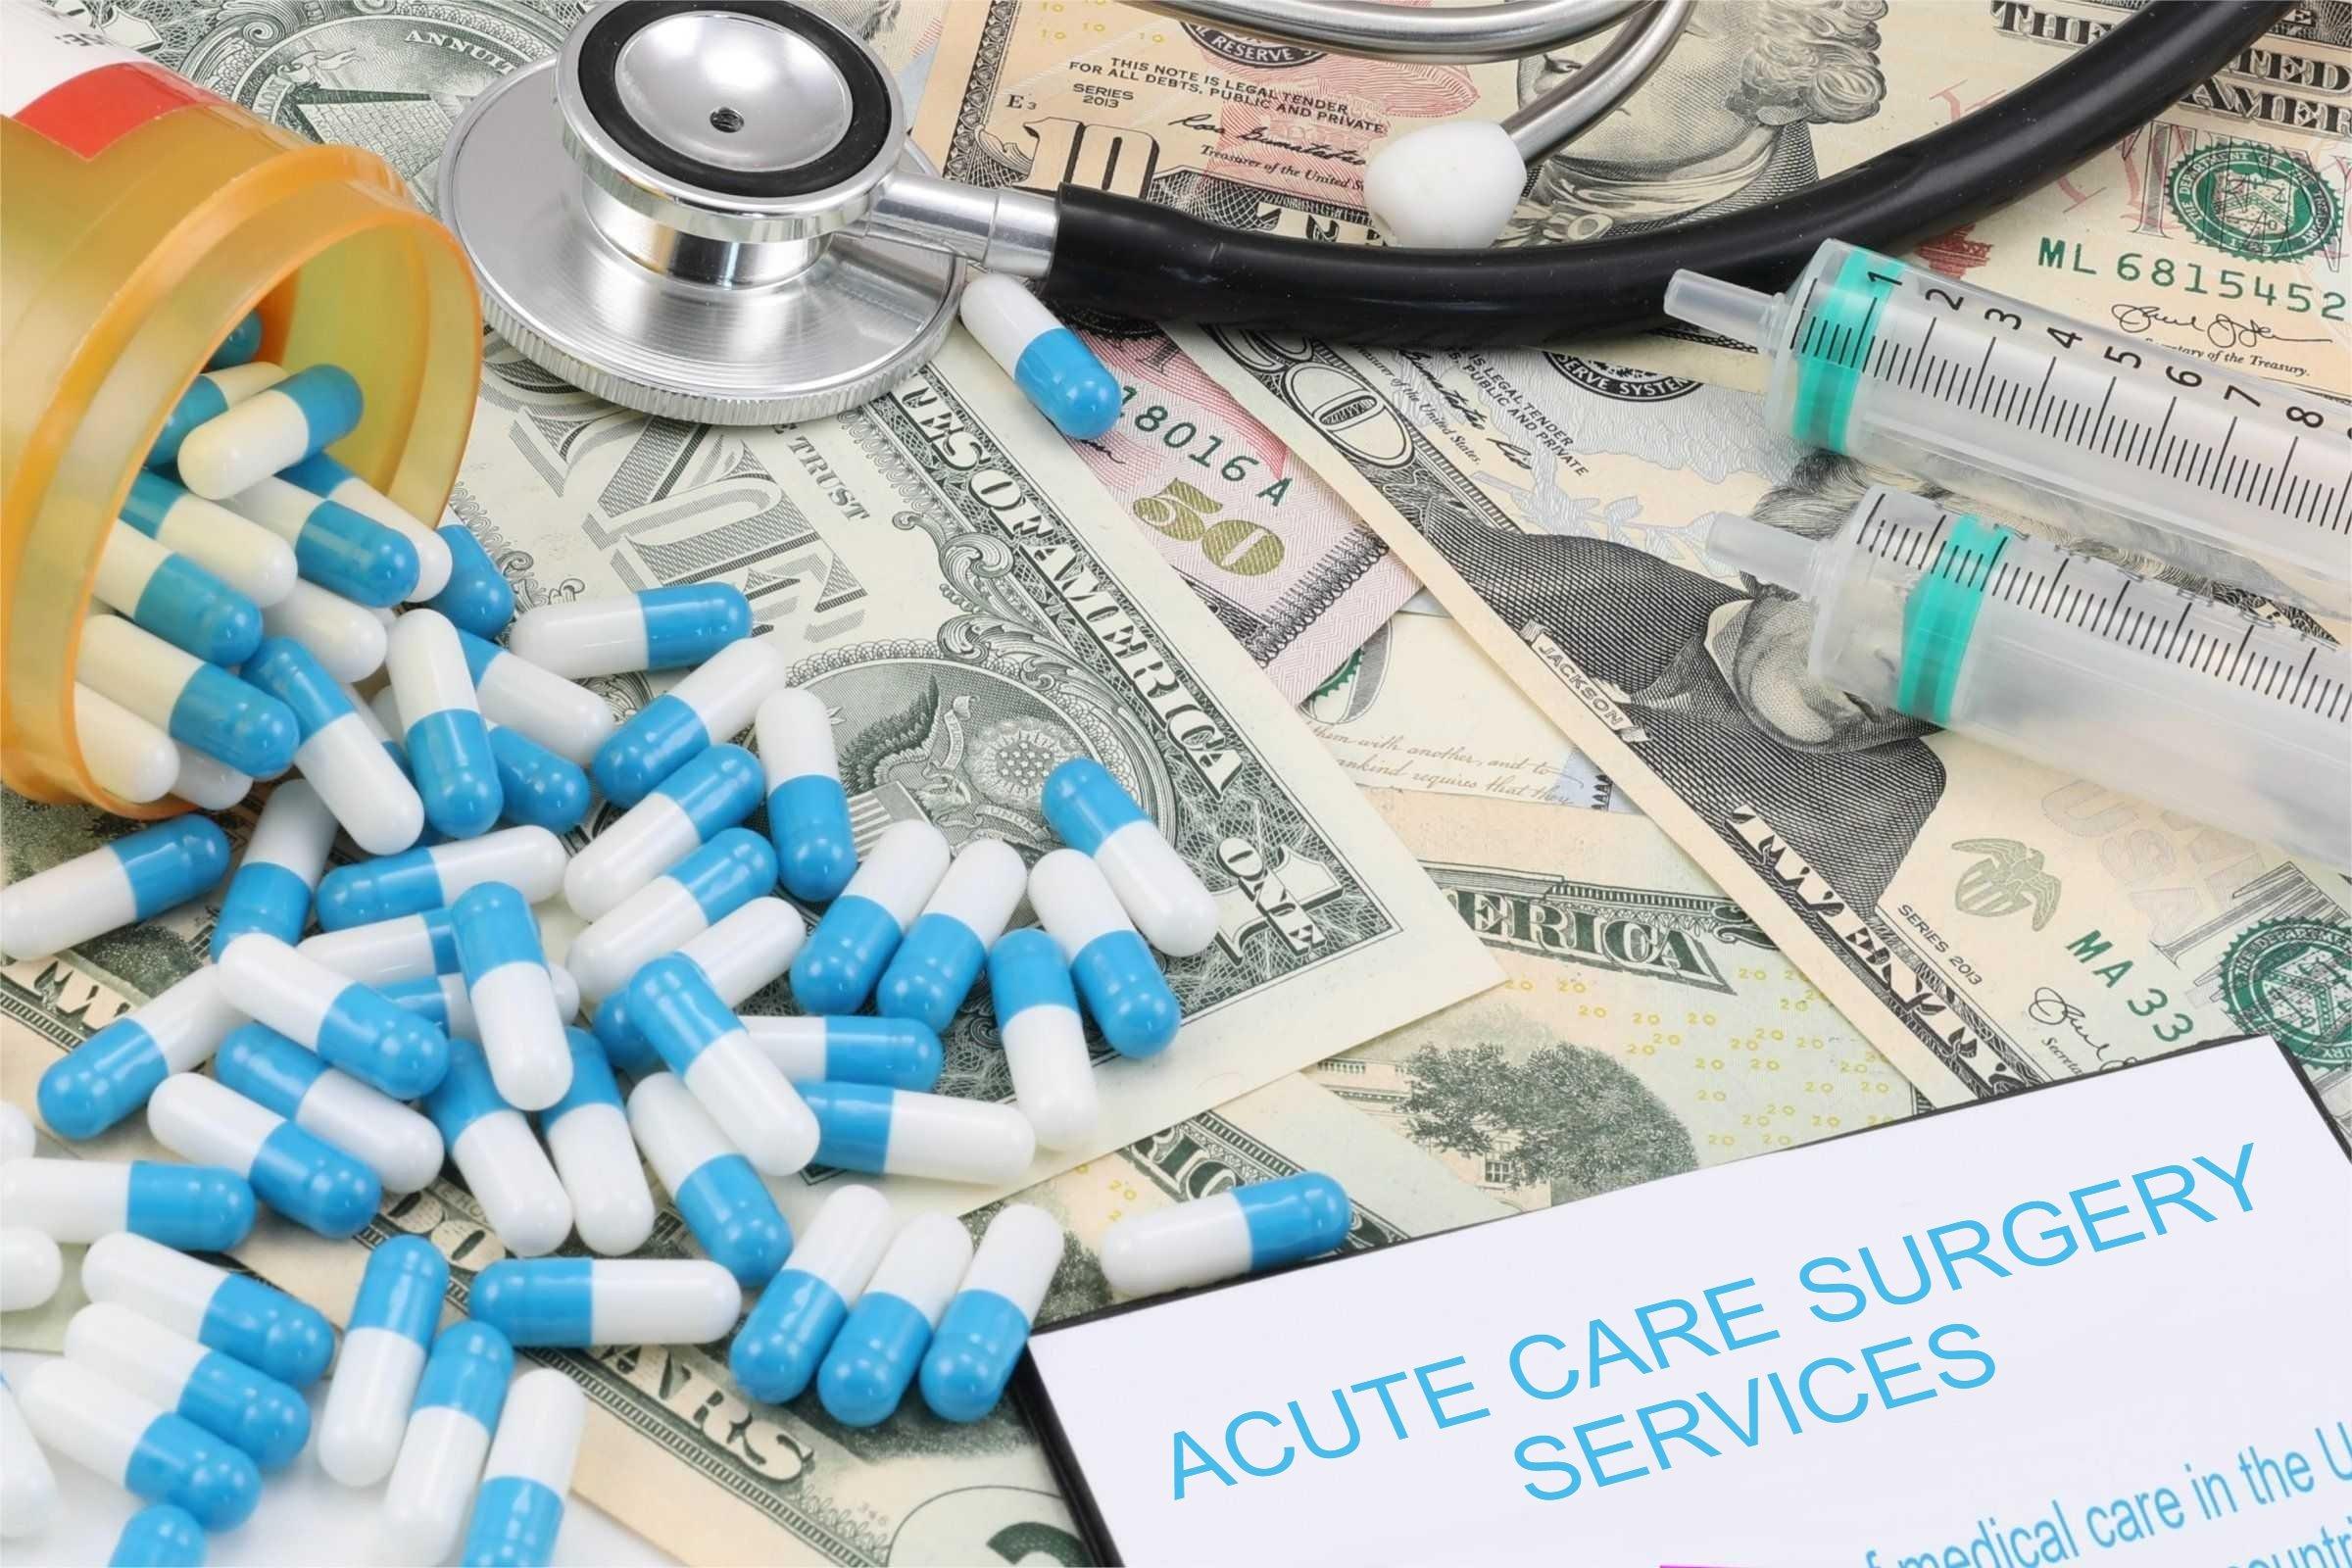 Acute Care Surgery Services